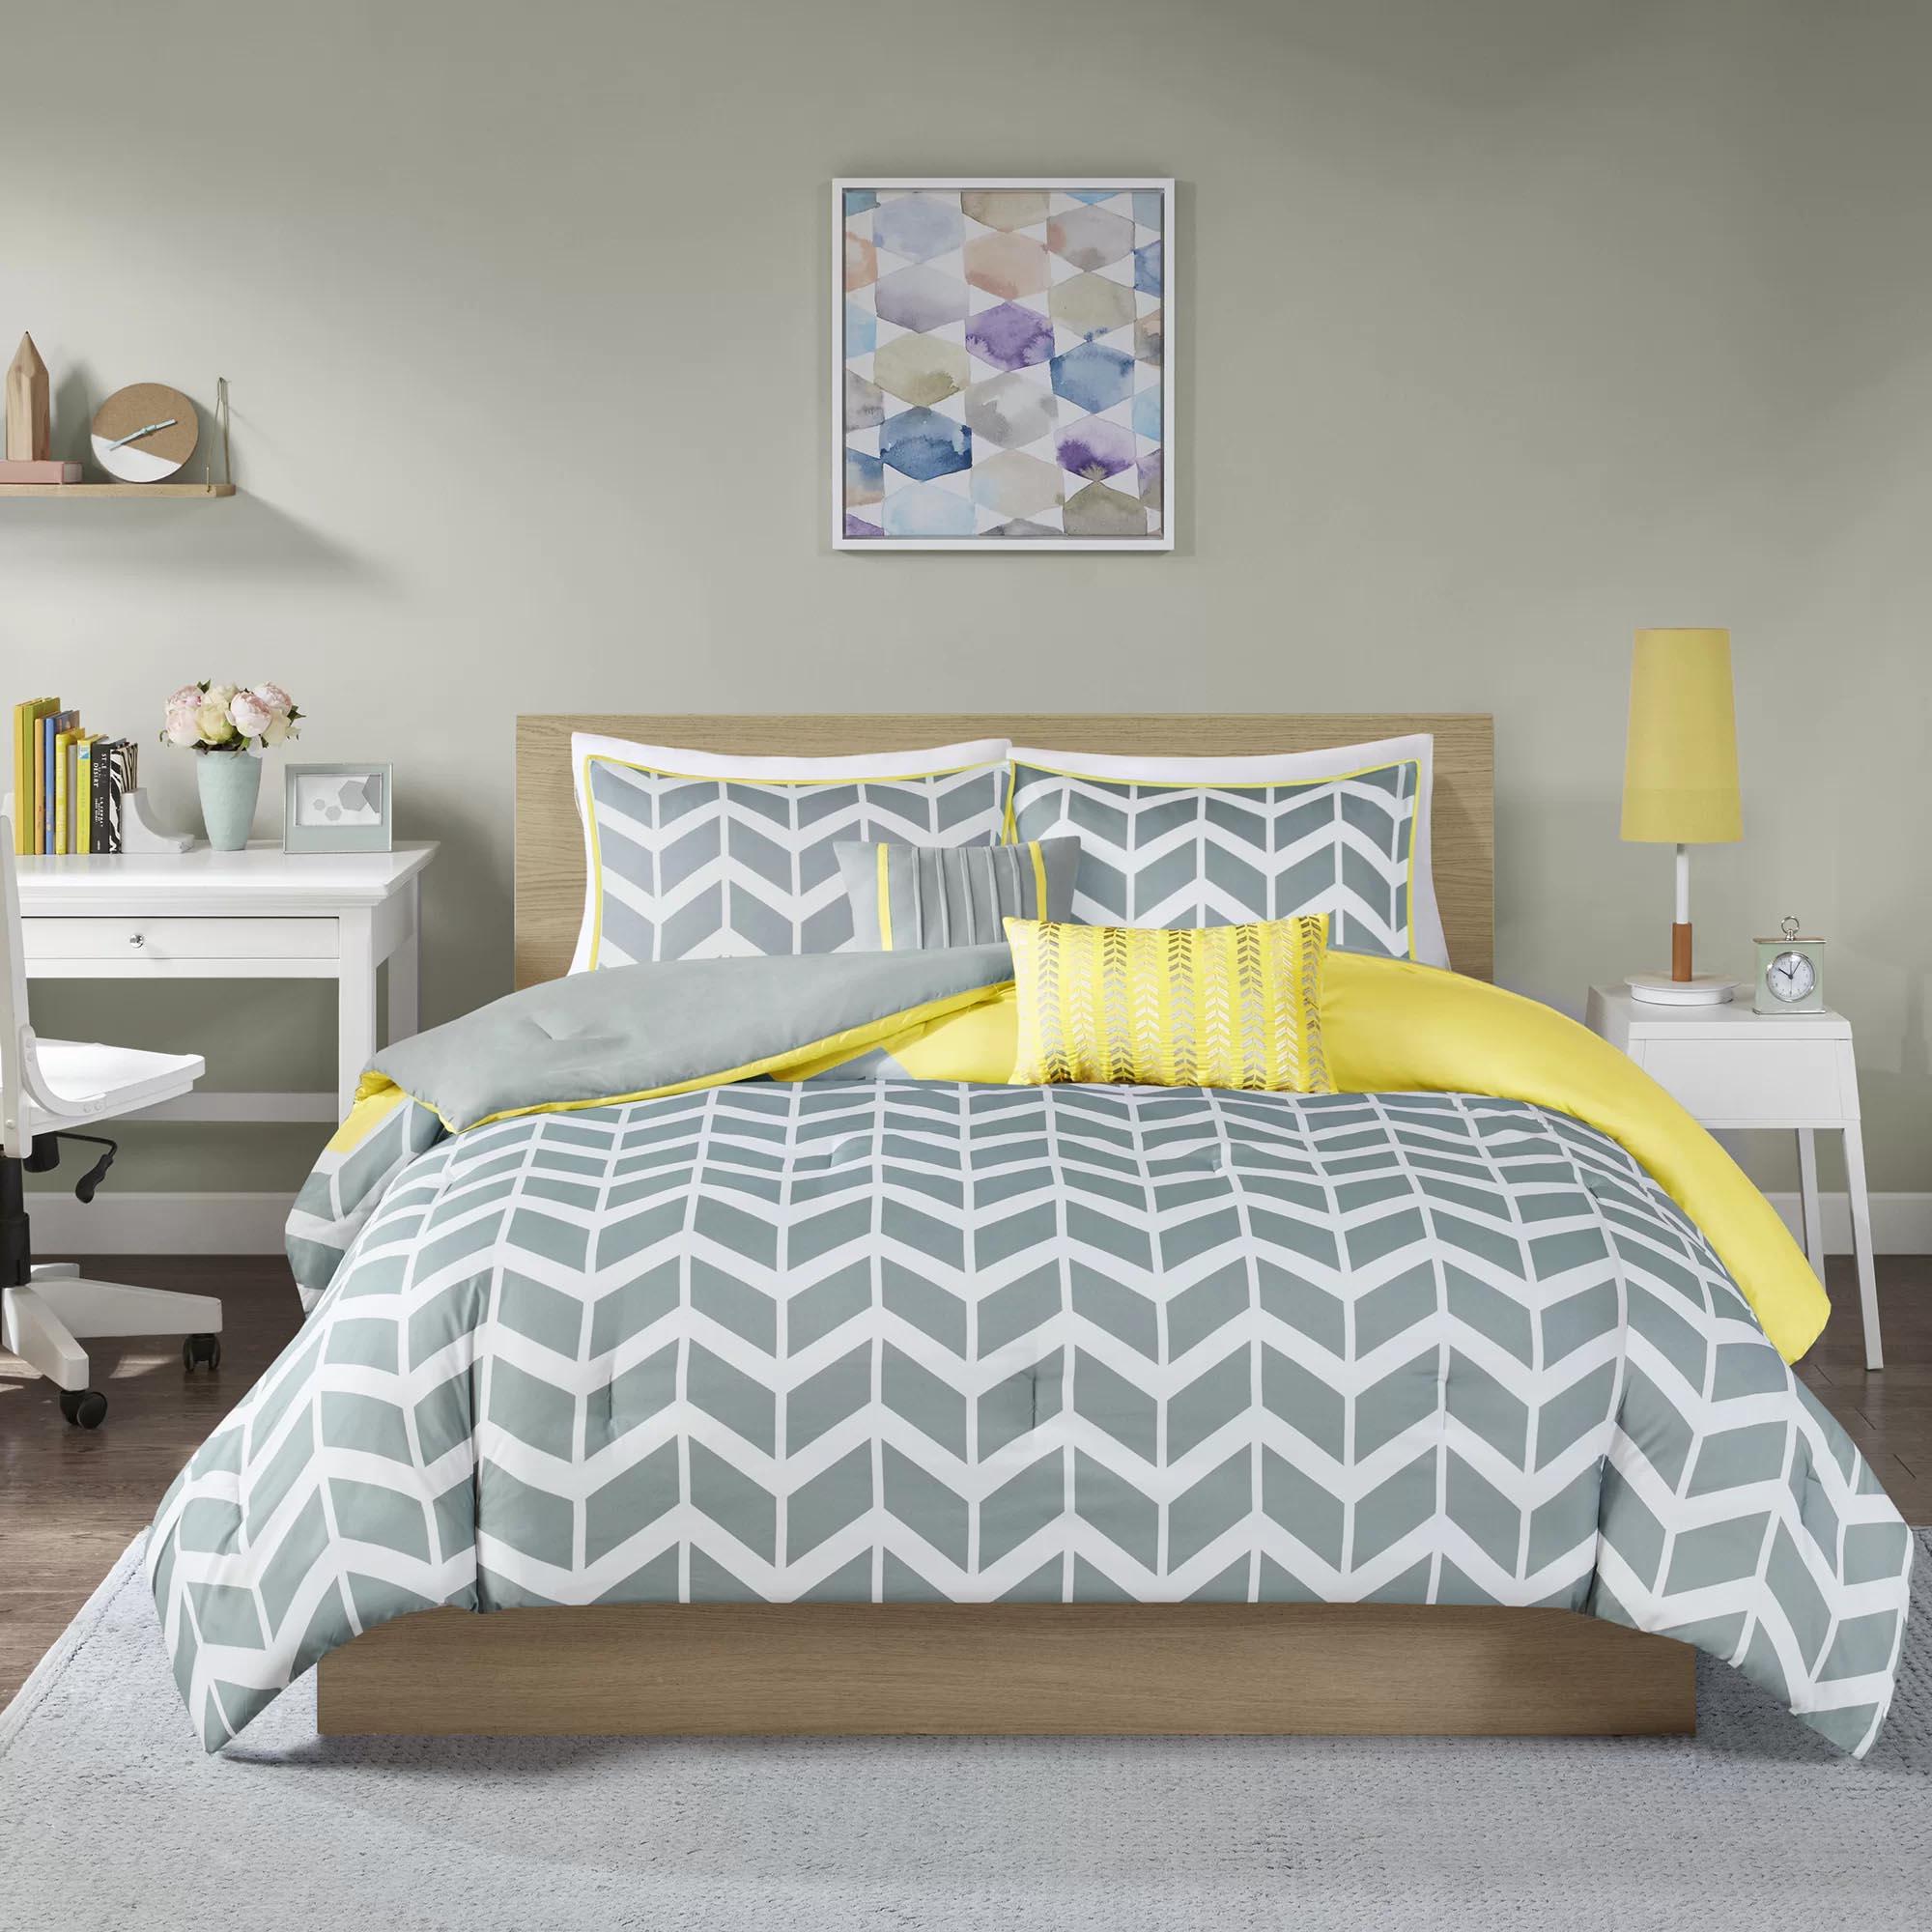 Modern Bedroom Decor - Grey, white, and yellow geometric bedding.